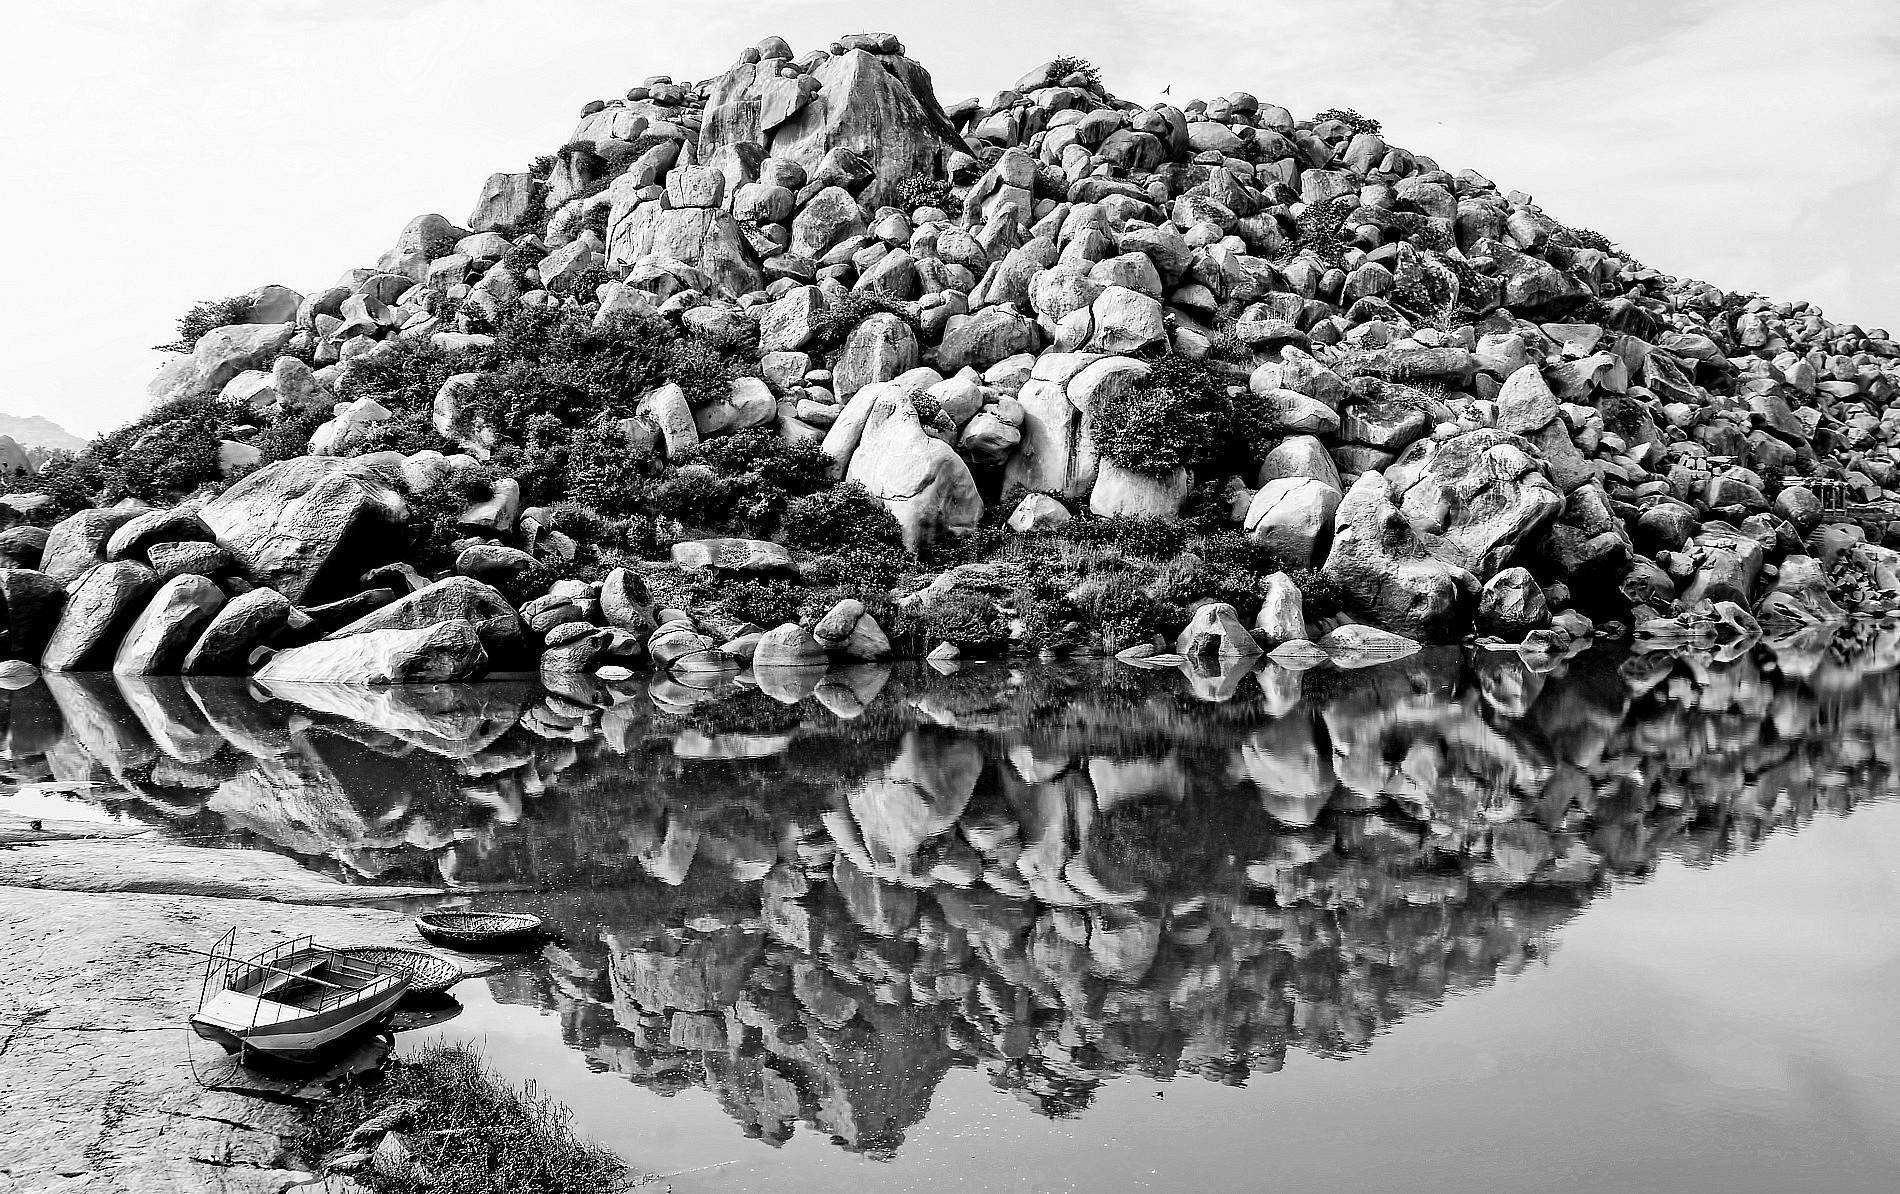 Hampi.....the city of boulders